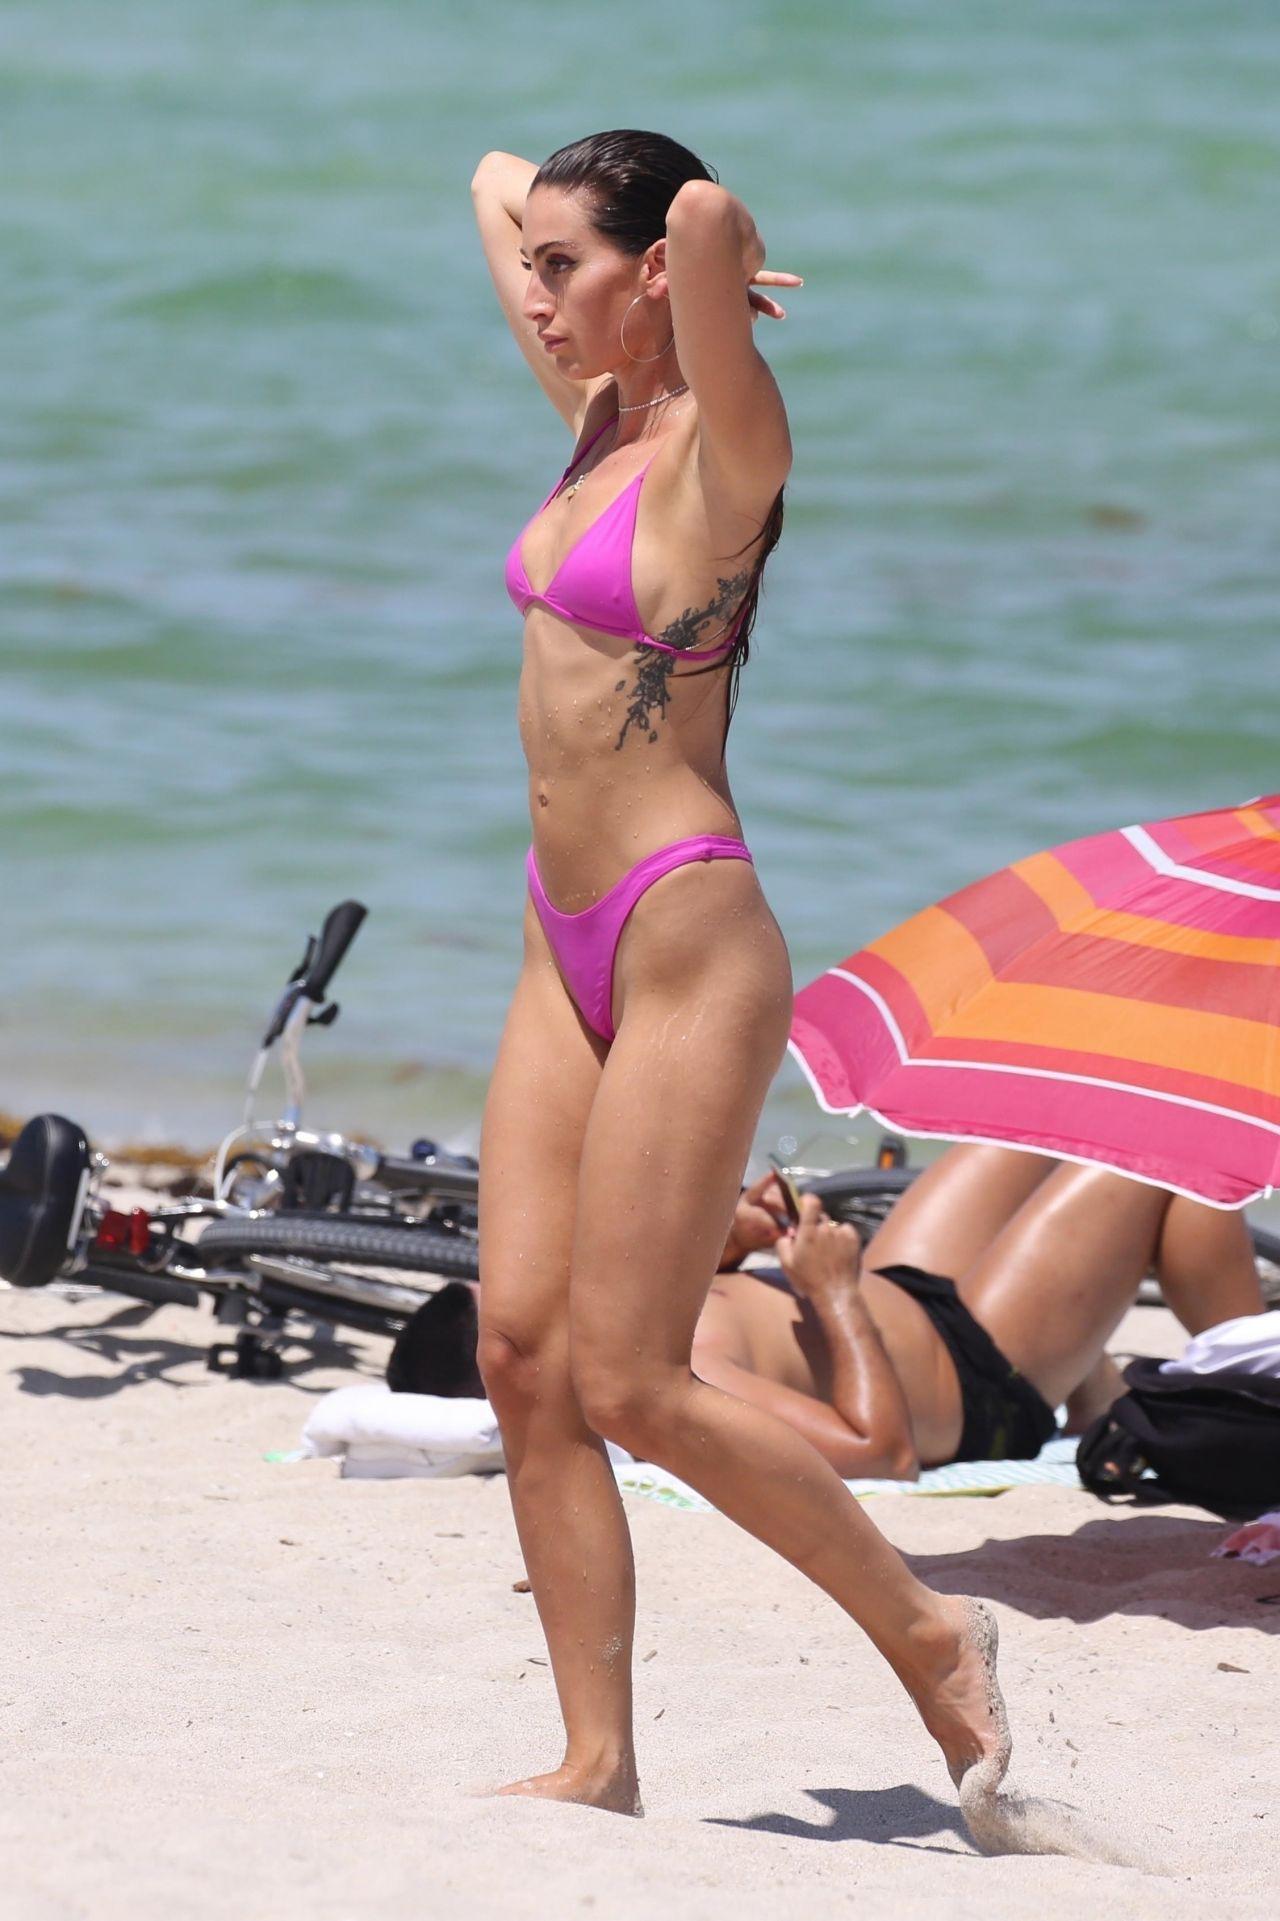 Bikini Kaylee Ricciardi naked (46 foto and video), Pussy, Hot, Feet, cameltoe 2017